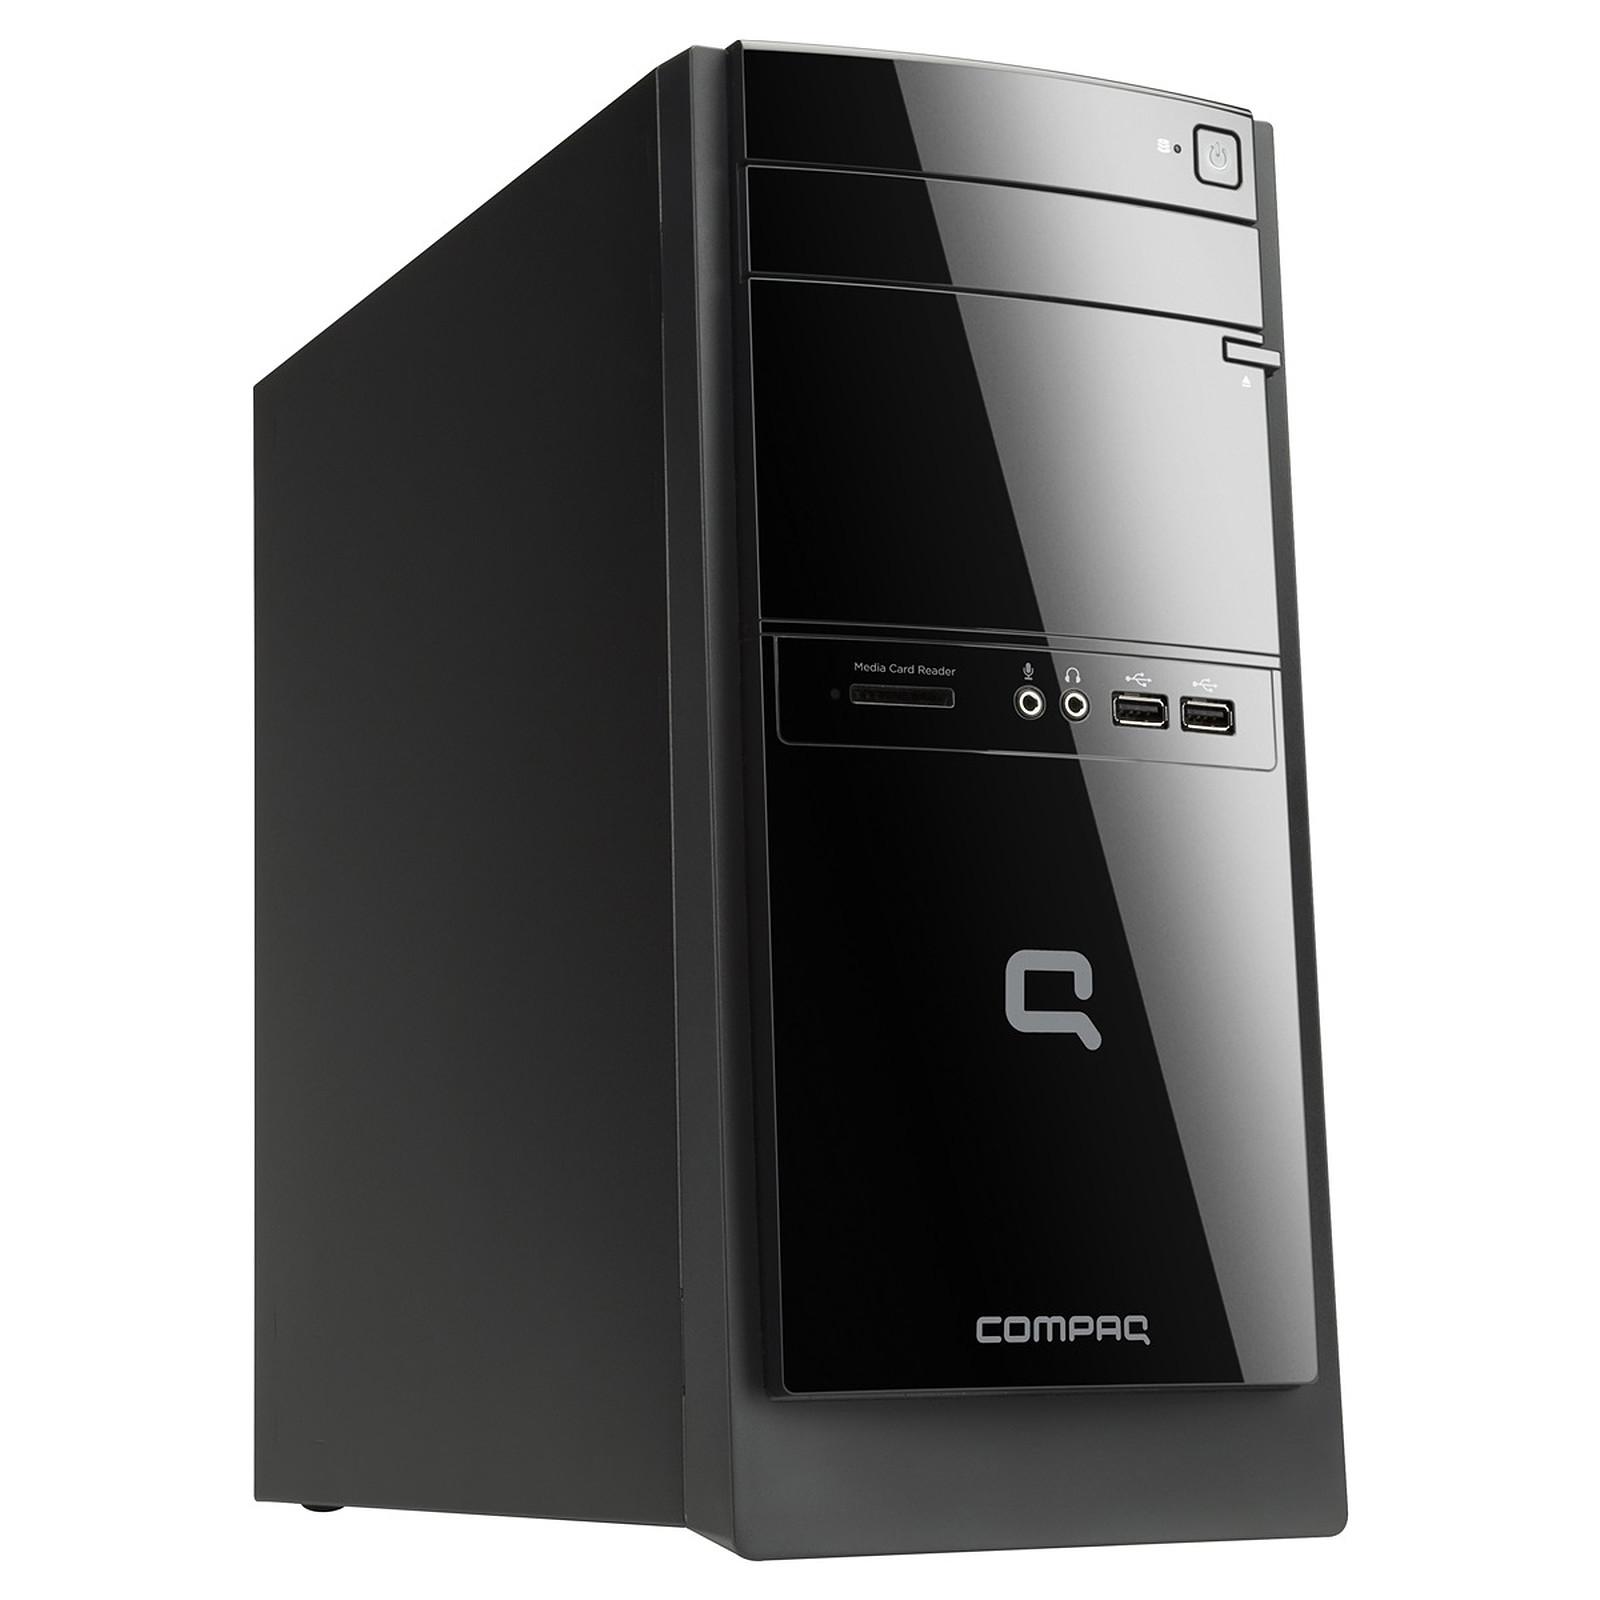 HP Compaq 110-335nf